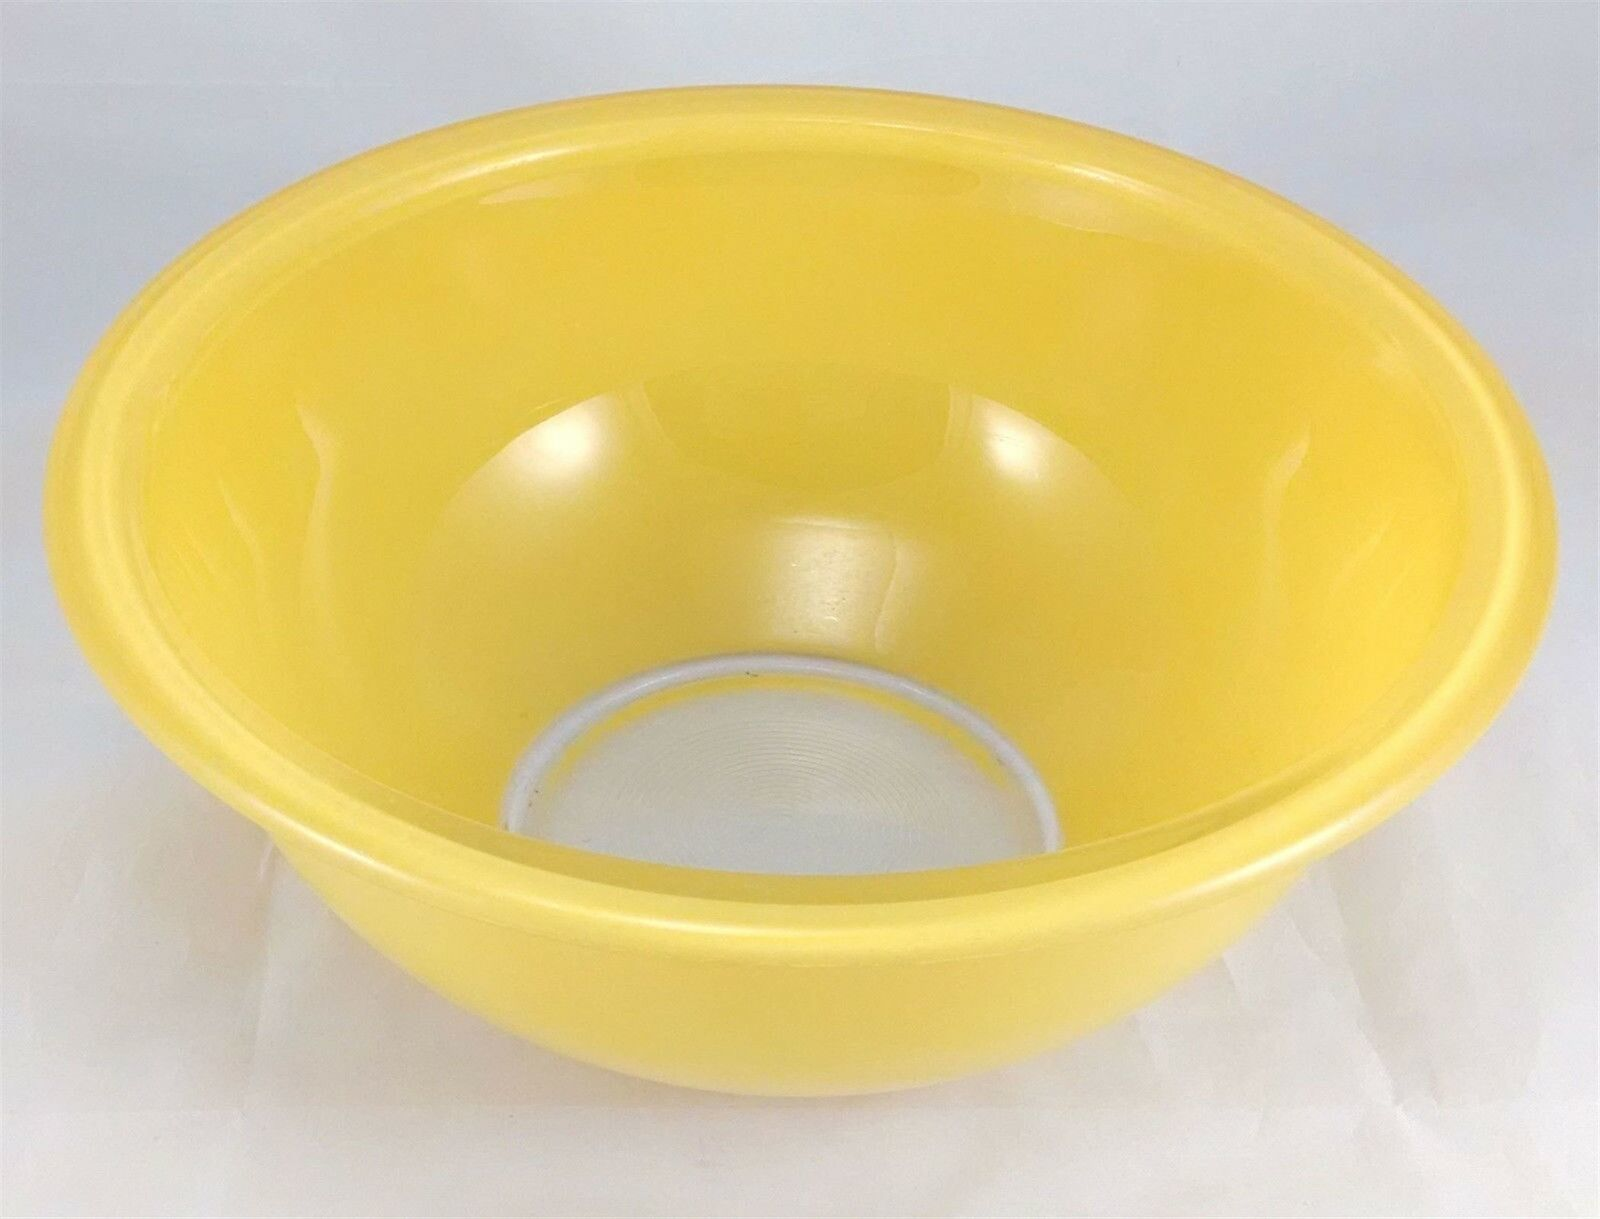 Pyrex 323 Yellow w/ Clear Bottom 1.5 Liter Vintage Mixing Bowl